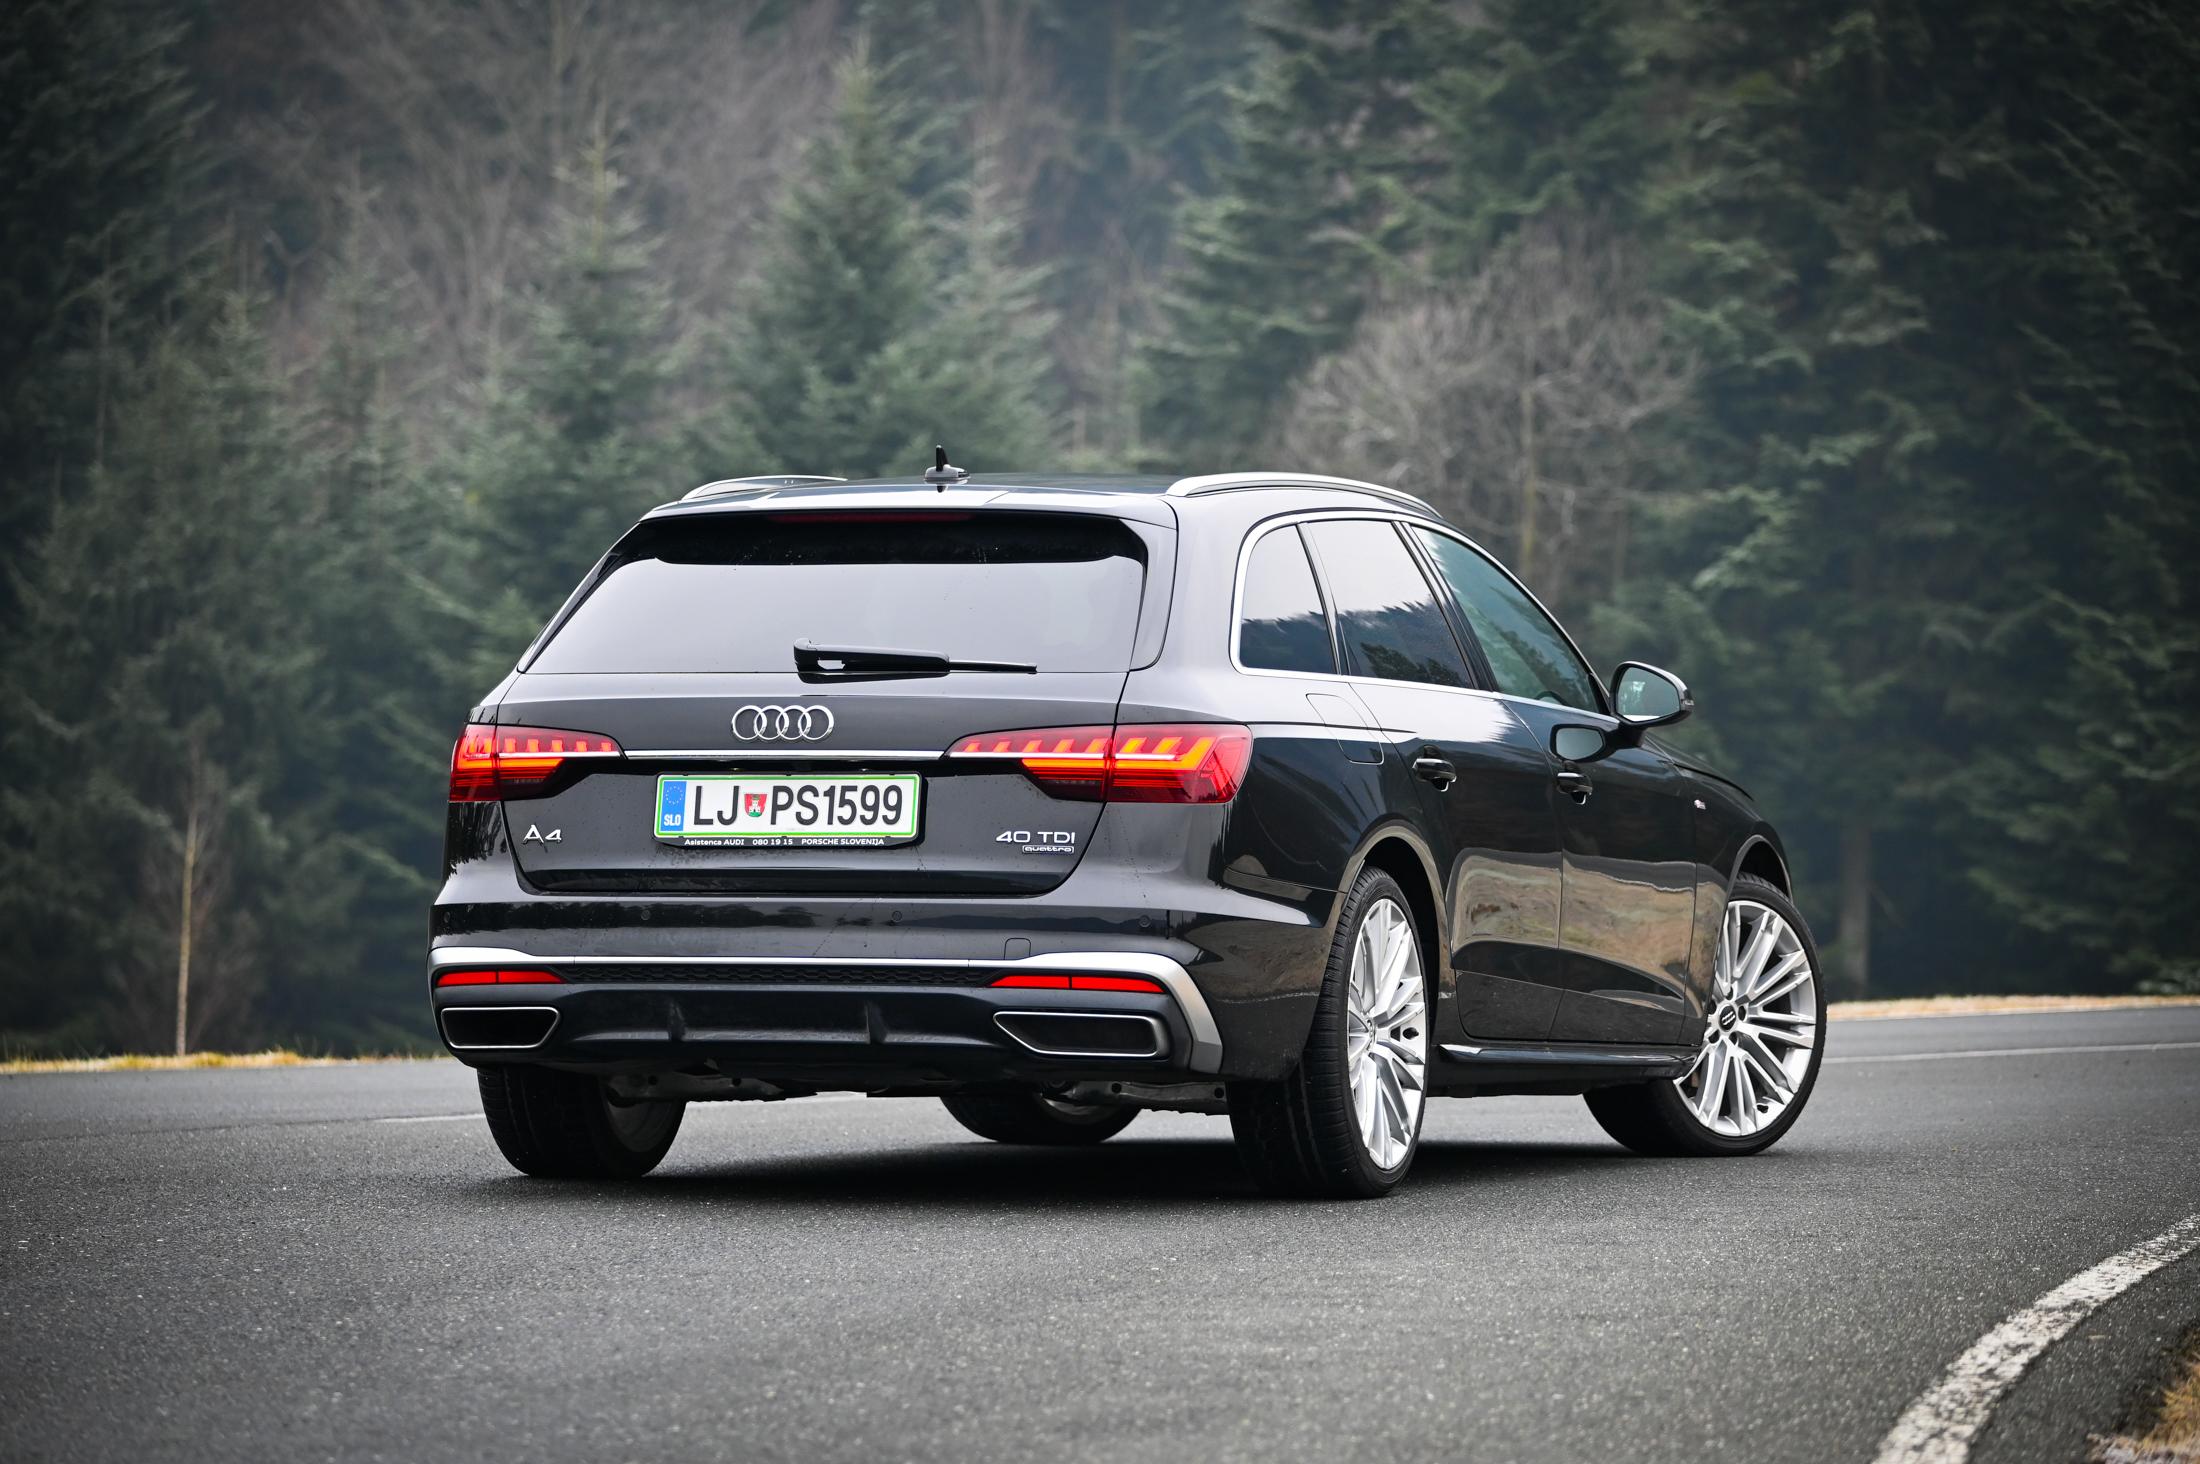 Kratek Test Audi A4 Avant 40 Tdi Quattro S Line S Tronic Amzs